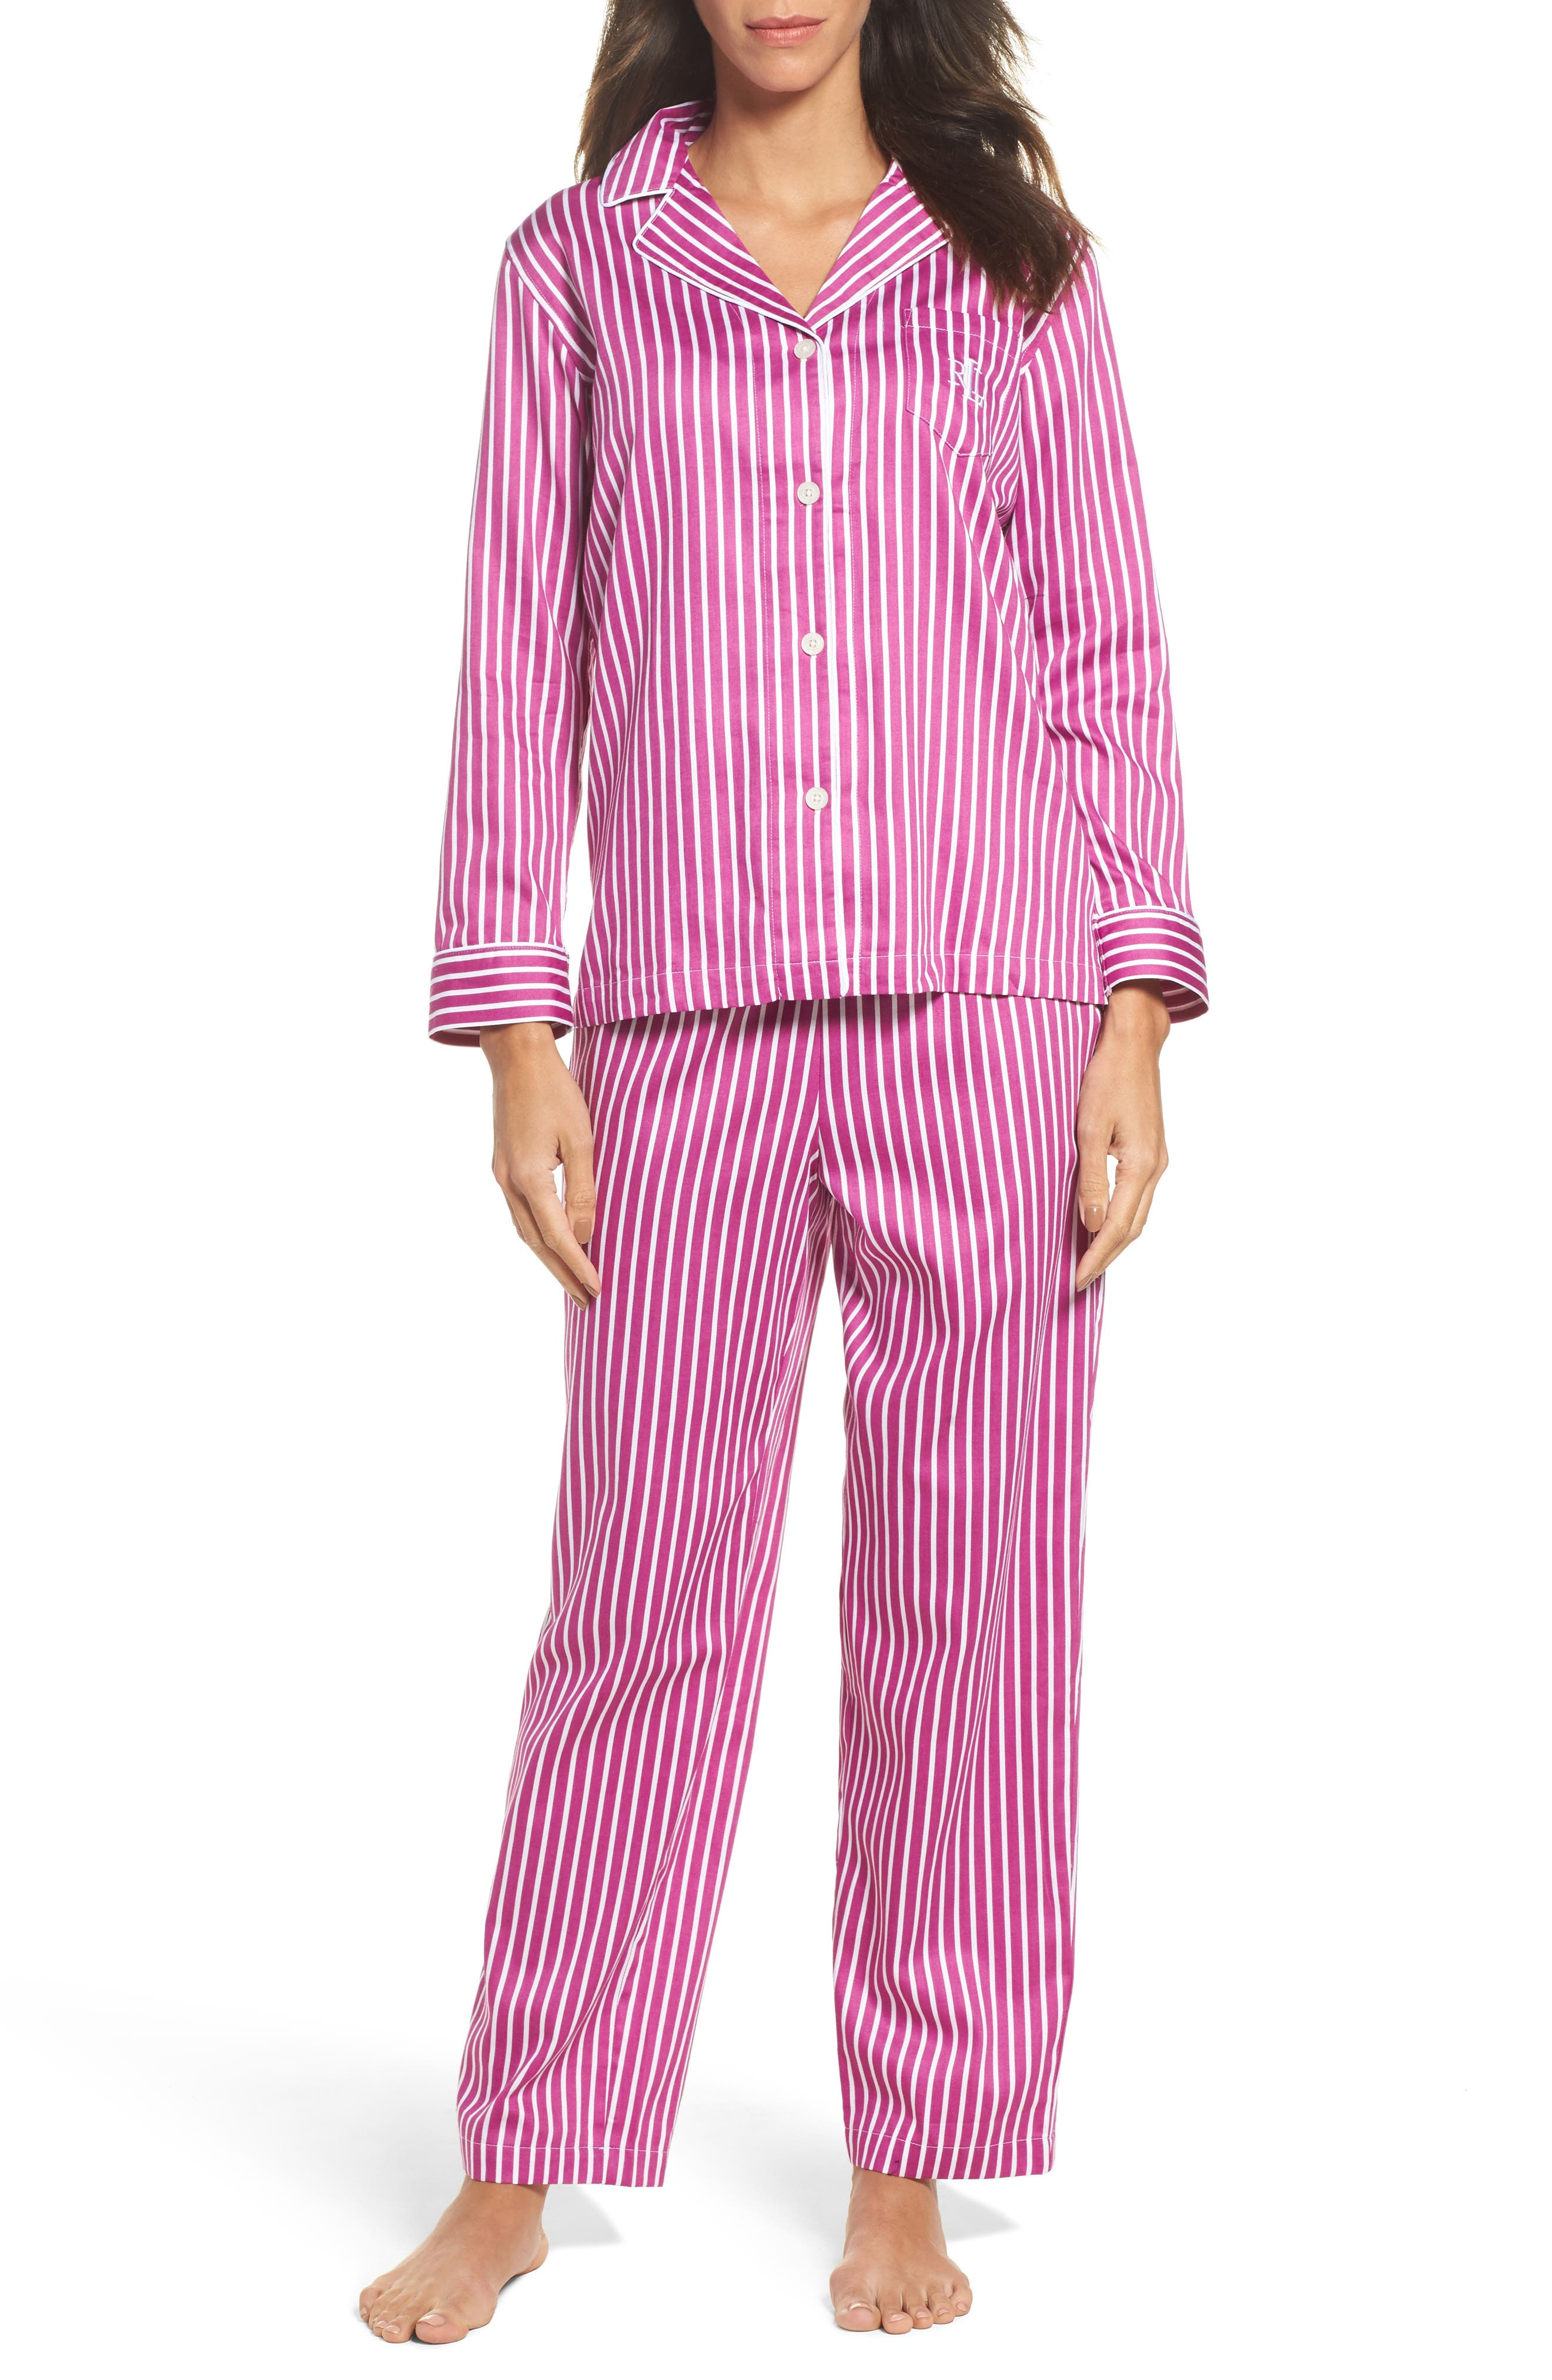 Notch Collar Pajamas,                             Main thumbnail 1, color,                             Pink/ White Stripe